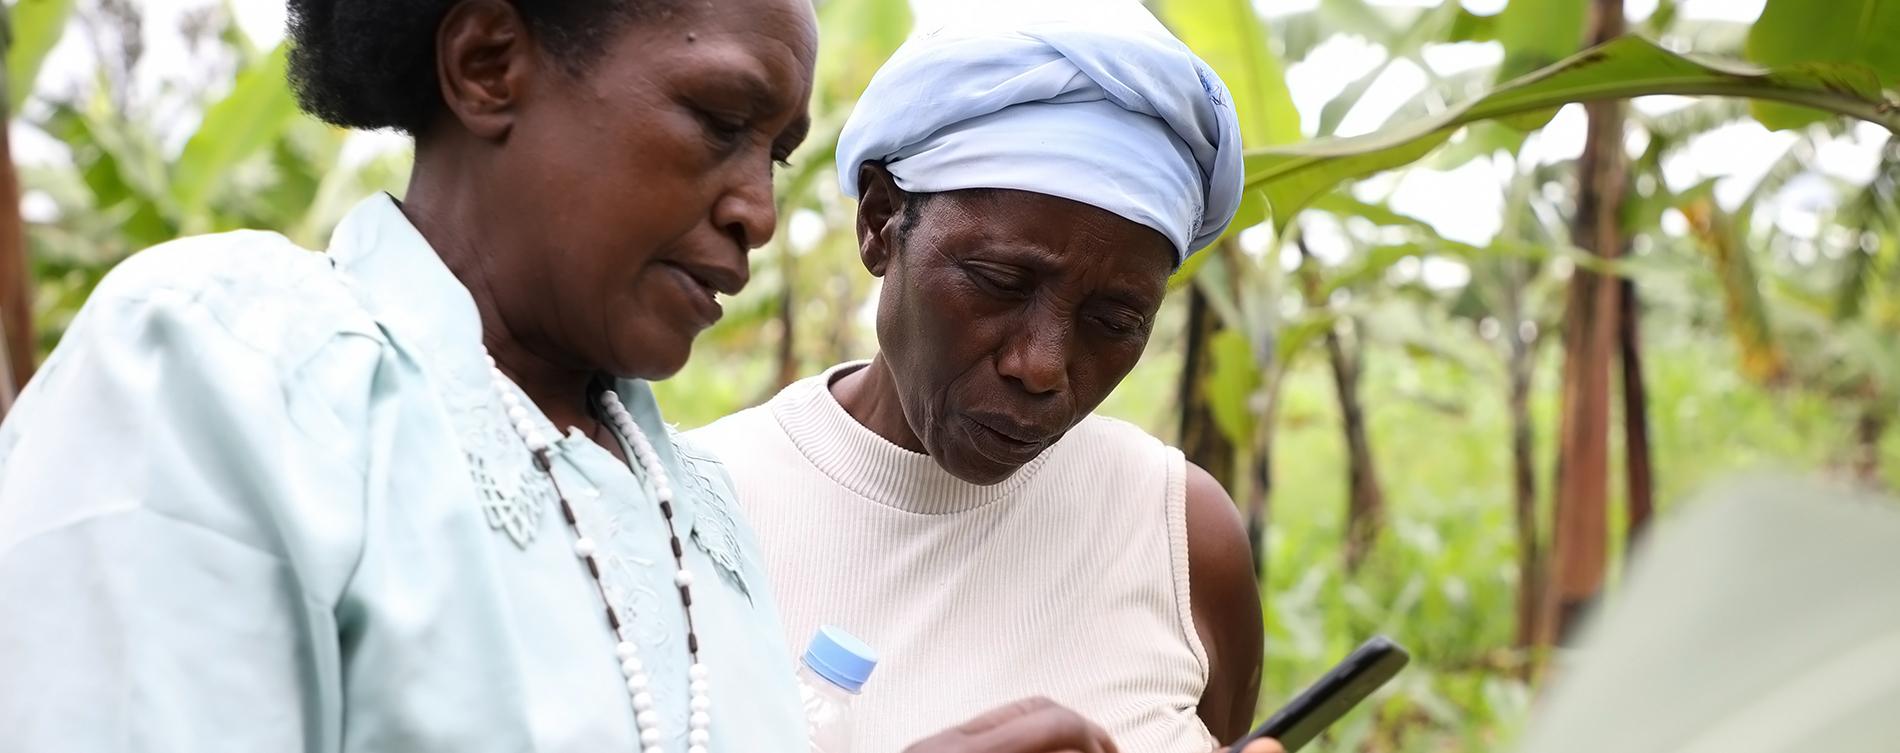 IITA-Rwanda releases a digital application in the fight against bacterial wilt disease in bananas